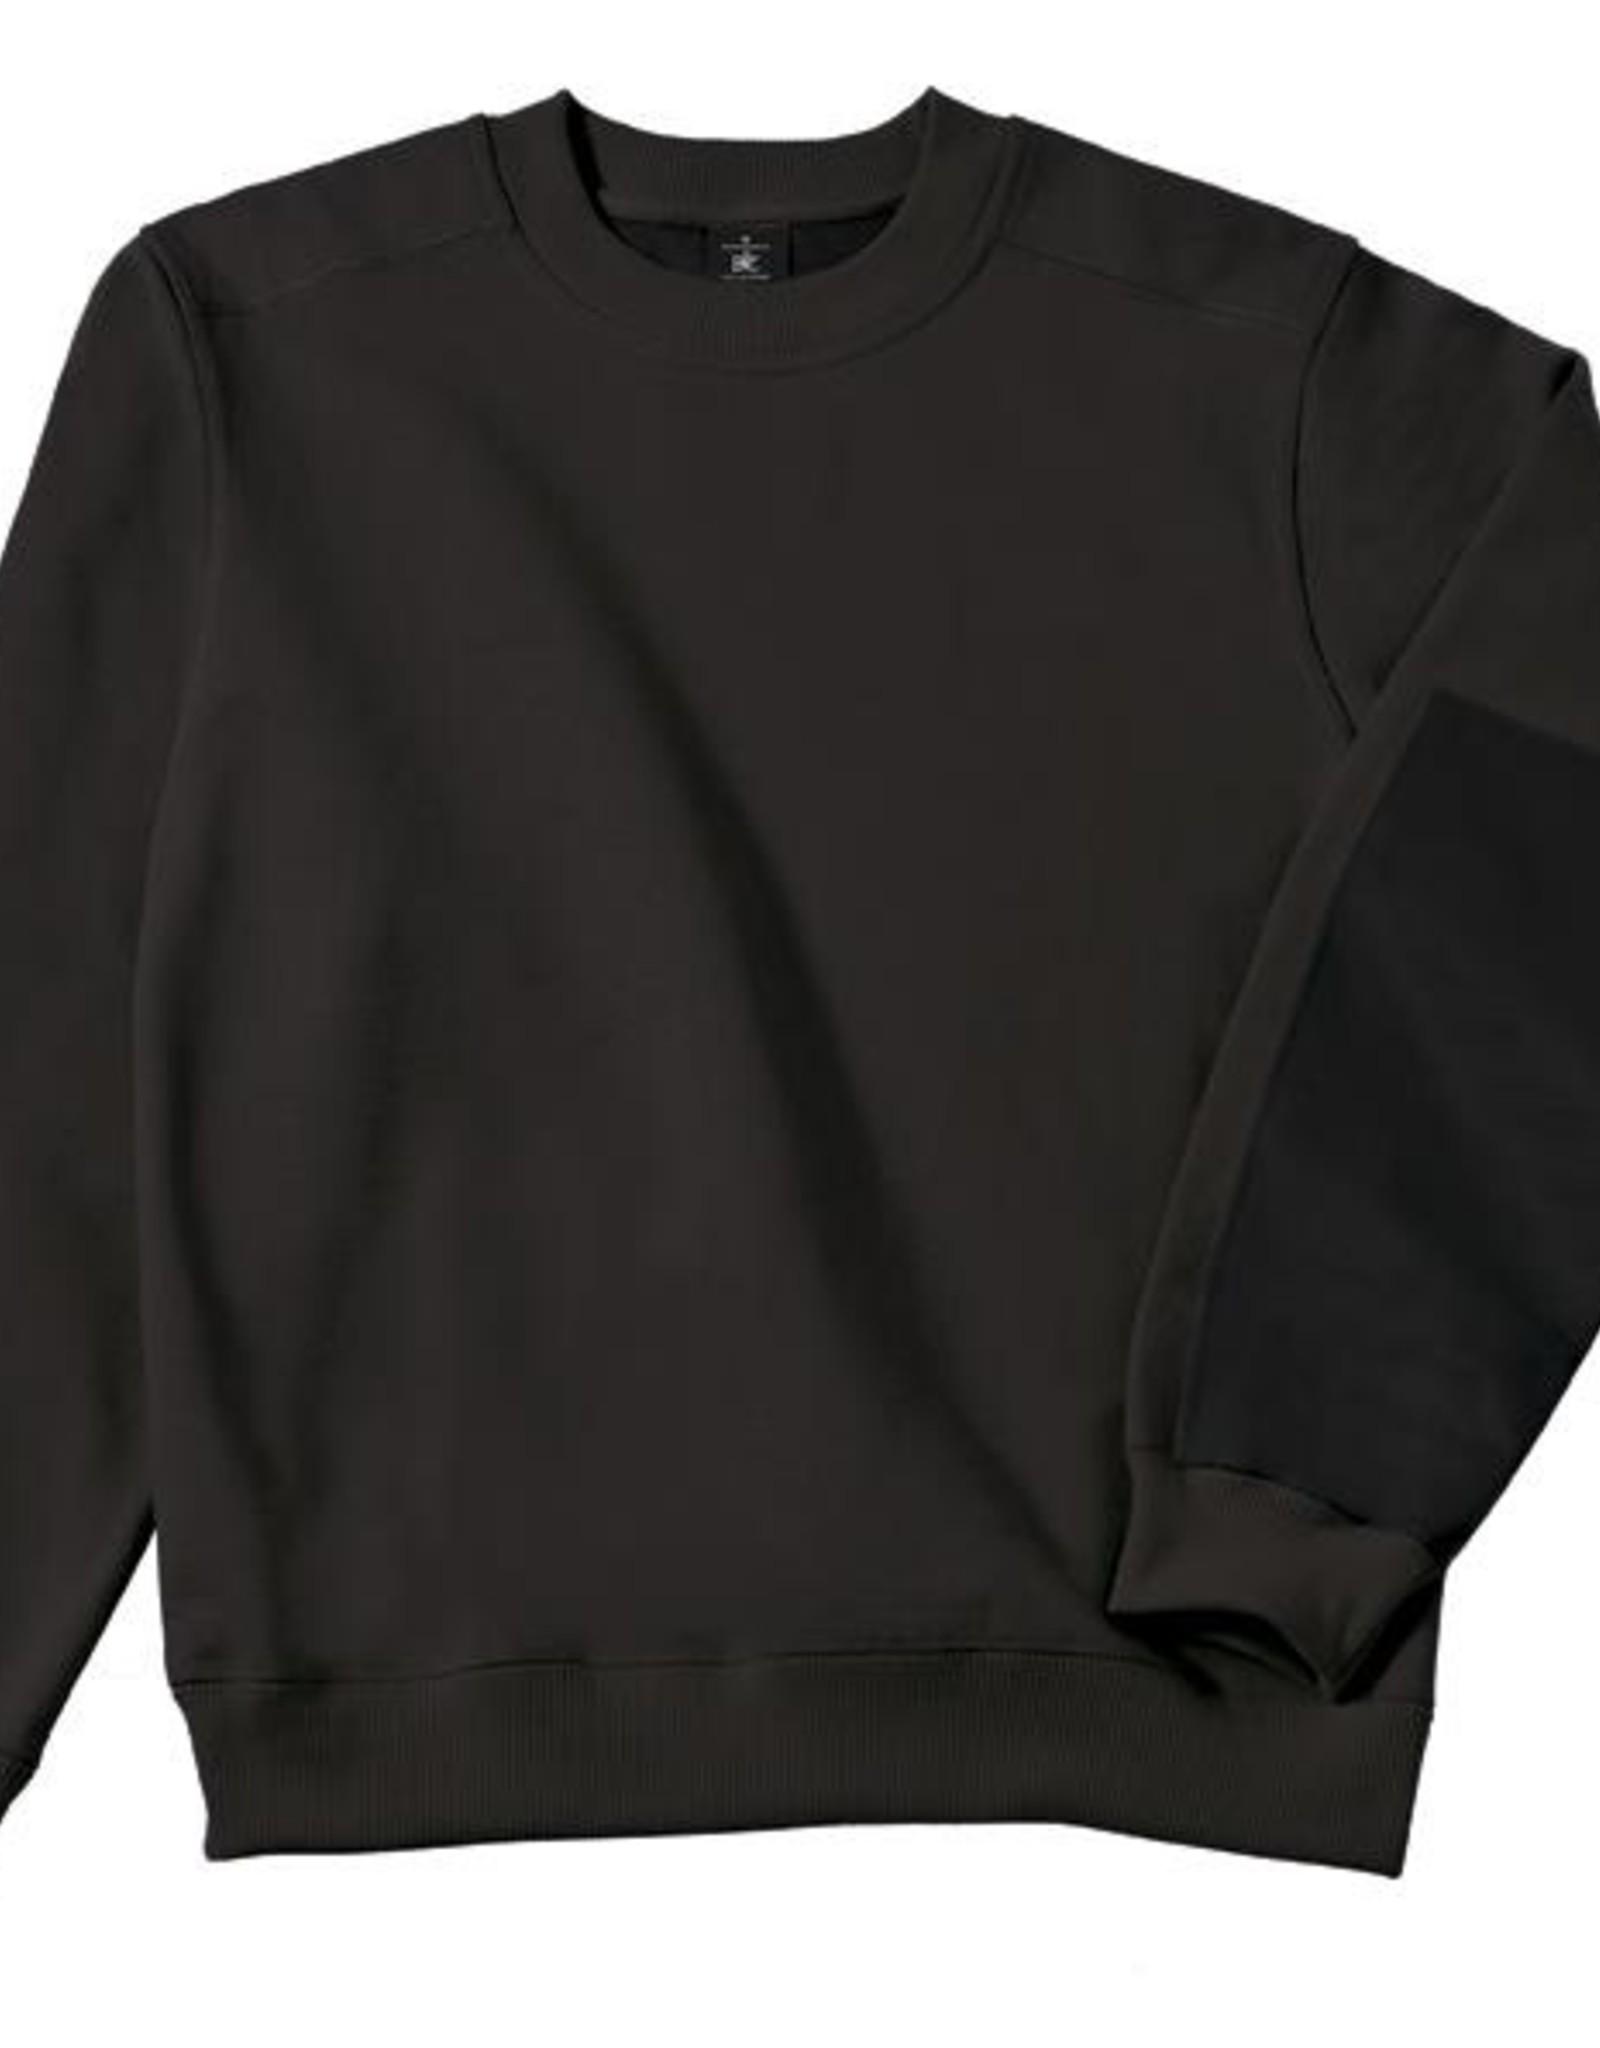 B&C Workwear set-in SWEATER zwart